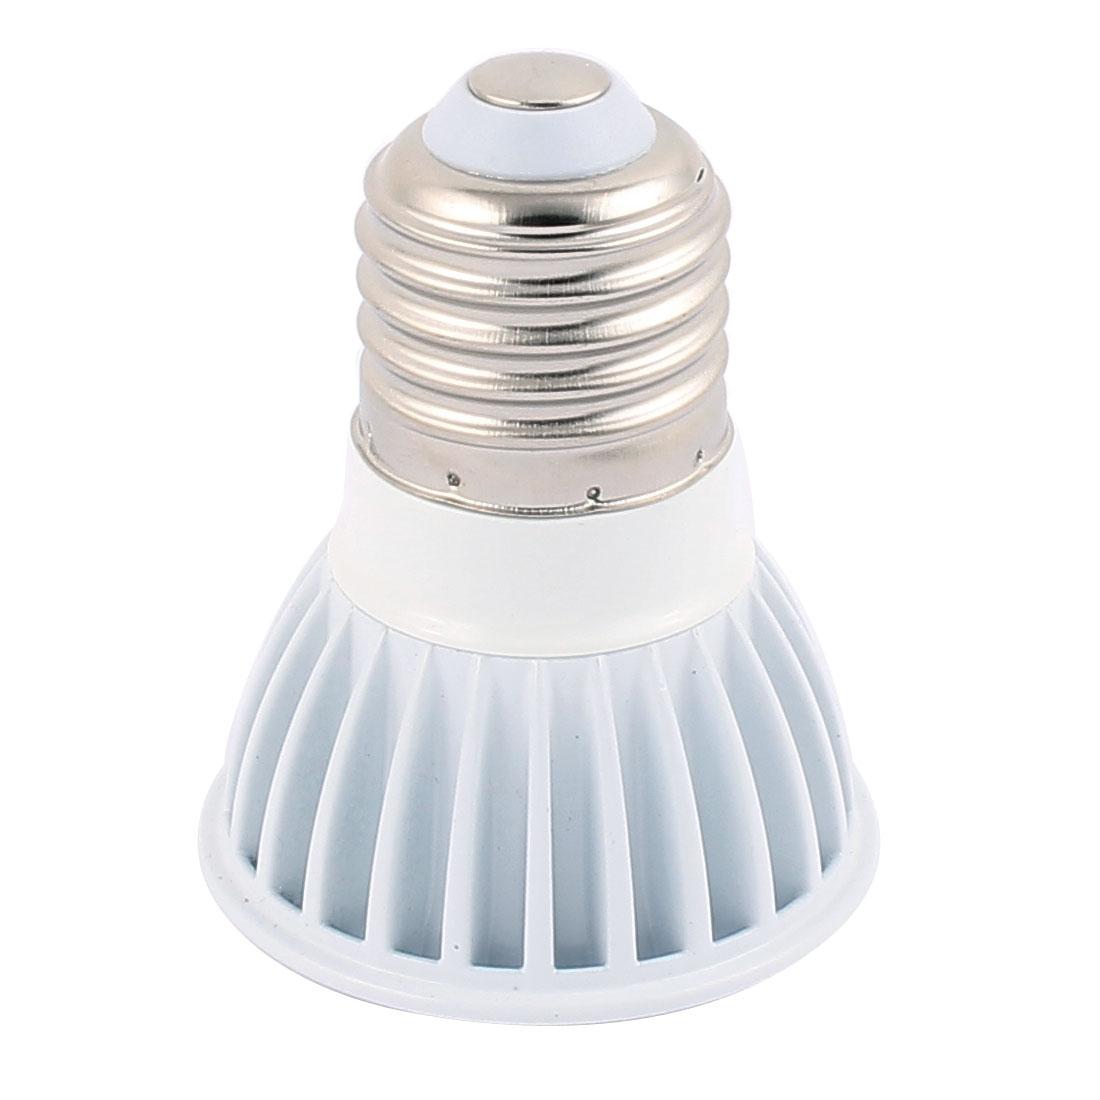 AC85-265V-5W-E27-COB-LED-Spotlight-Lamp-Bulb-Energy-Saving-Downlight-Pure-White